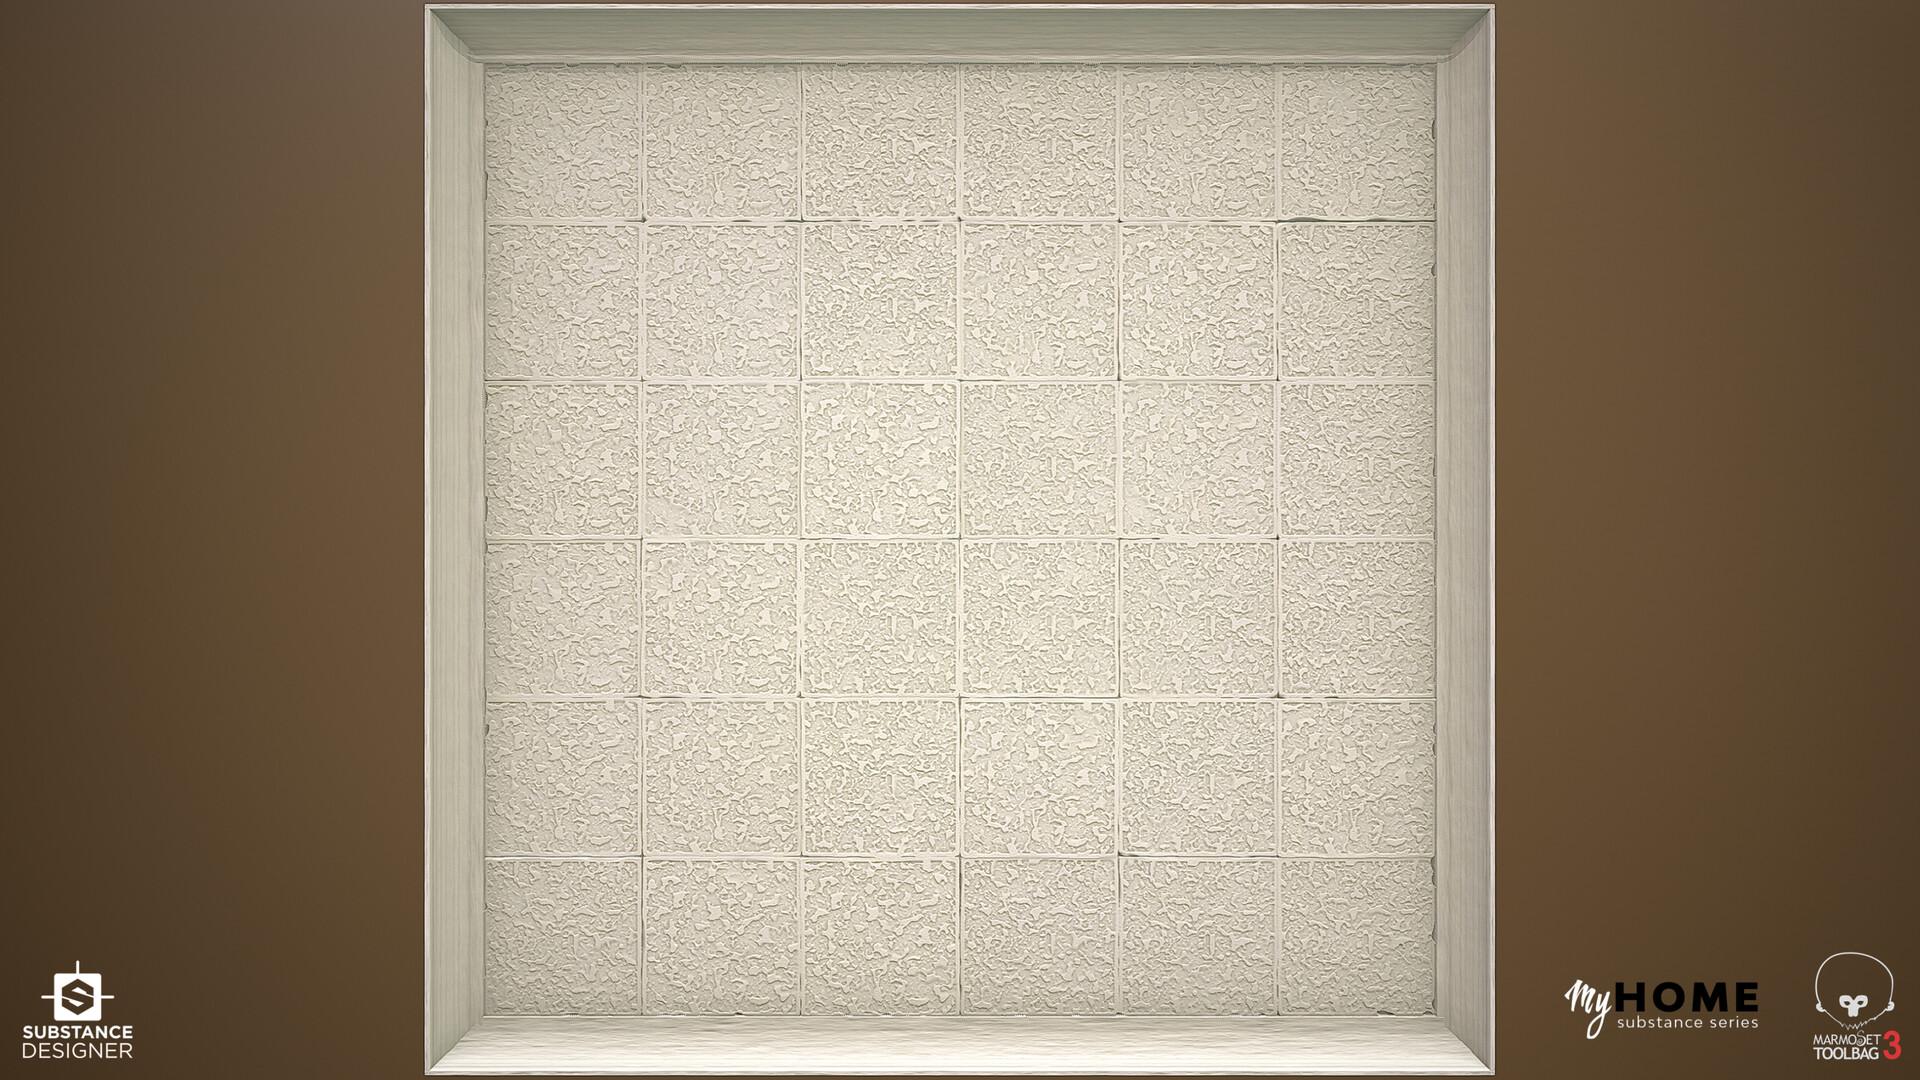 Gregory bove myroom ceiling render02